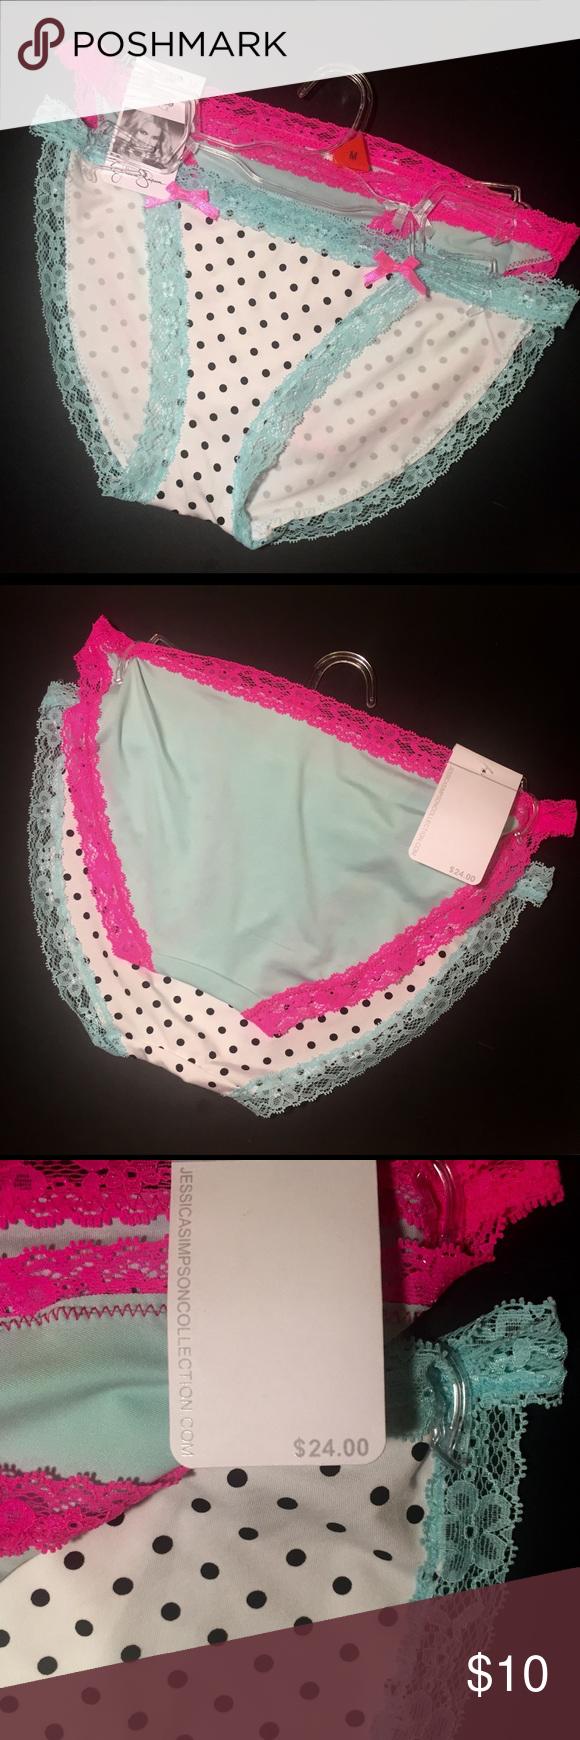 js bikini panties jessica simpson bikini cut underwear one pair is white and black polka